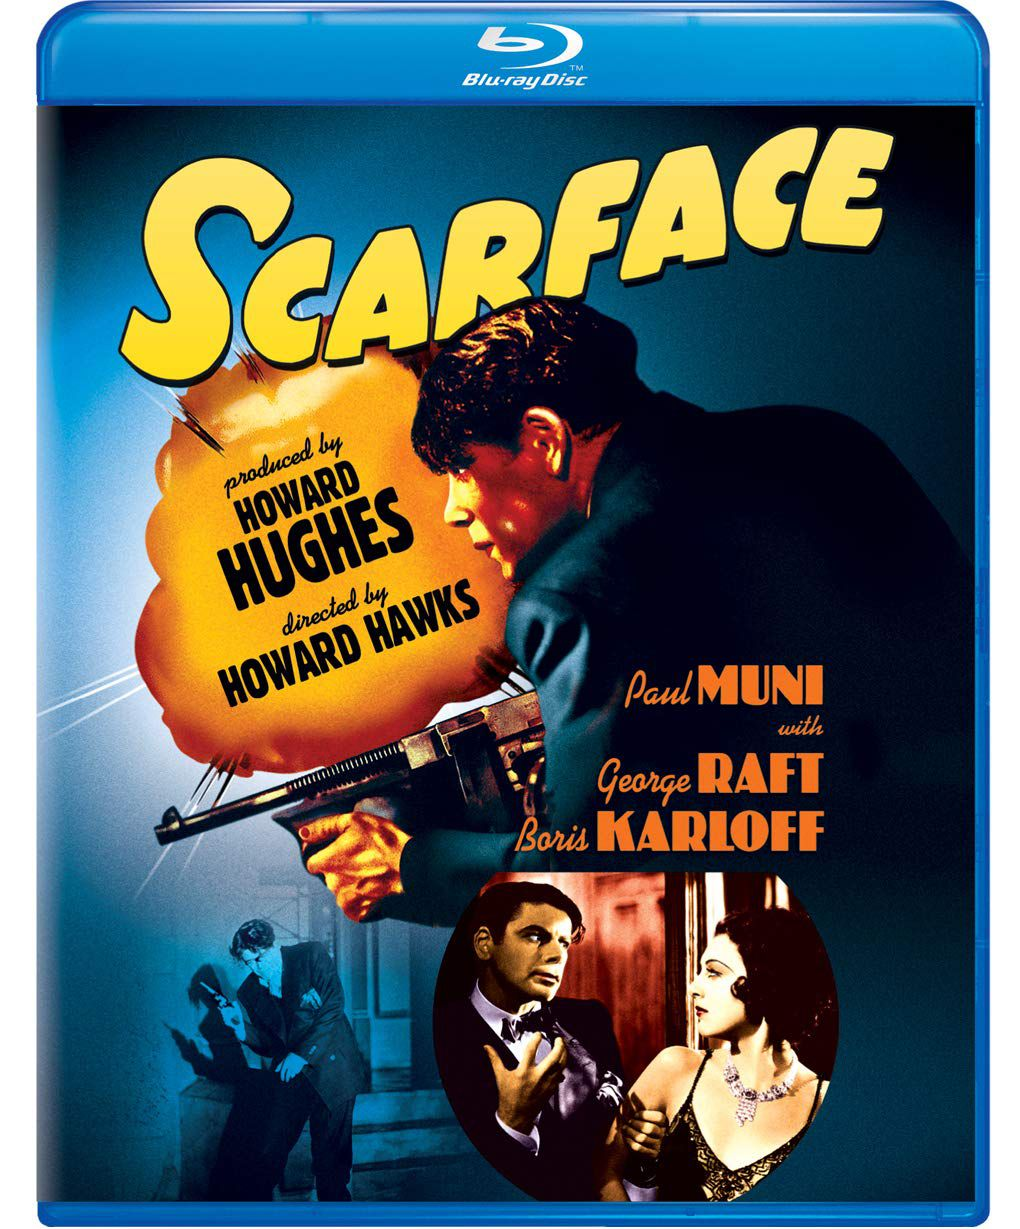 SCARFACE - Howard Hawks